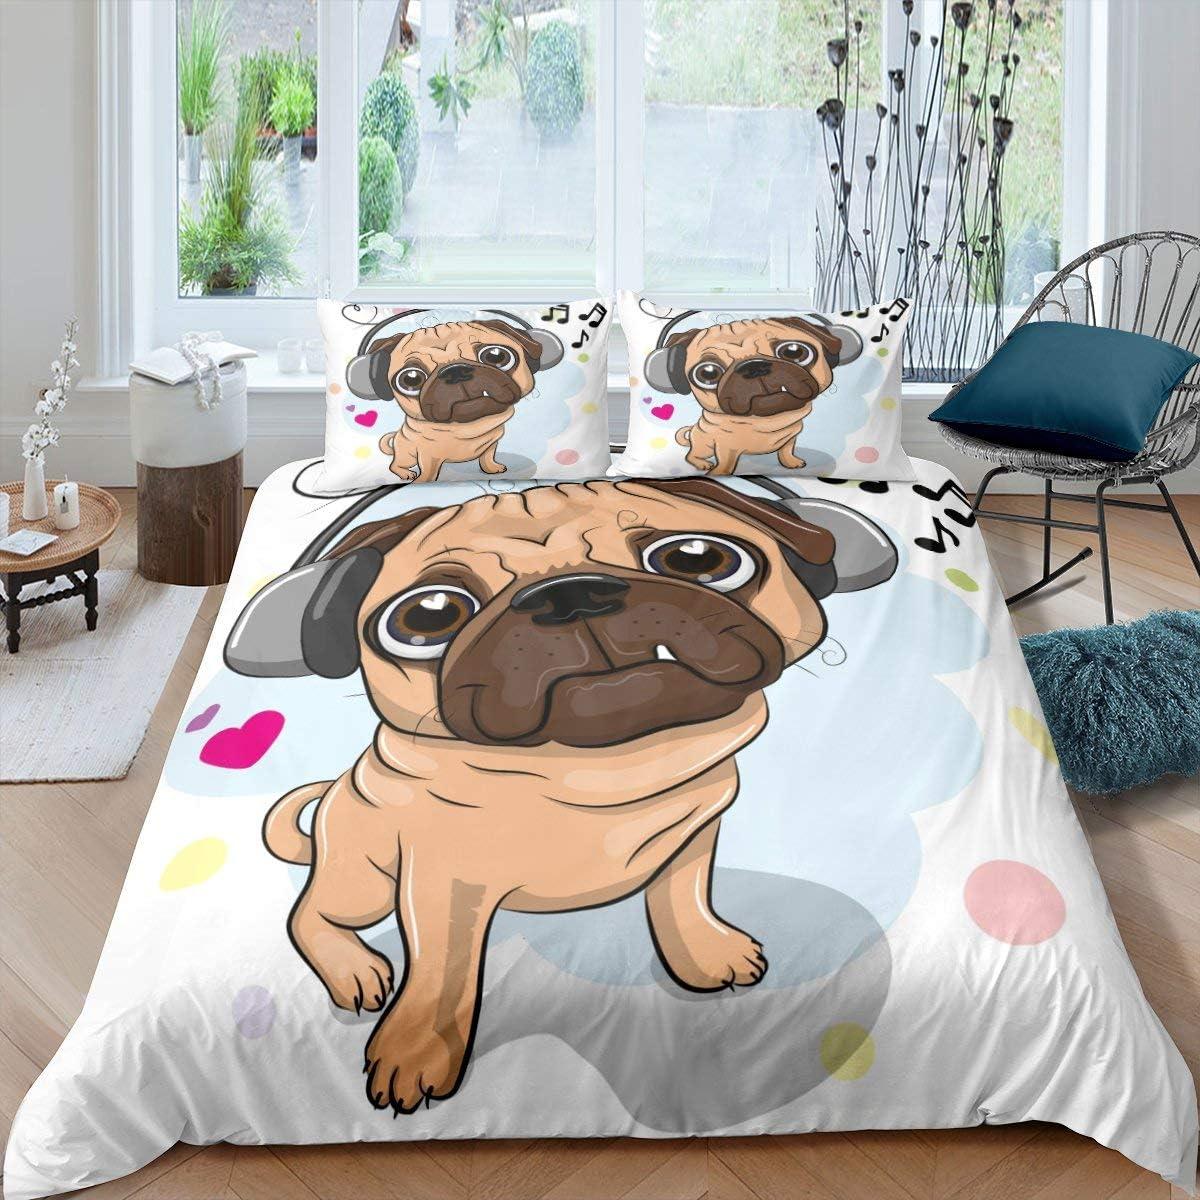 Cartoon Dog Bedding Set Music チープ Notes For Adu Cover Comforter 毎日続々入荷 Kids